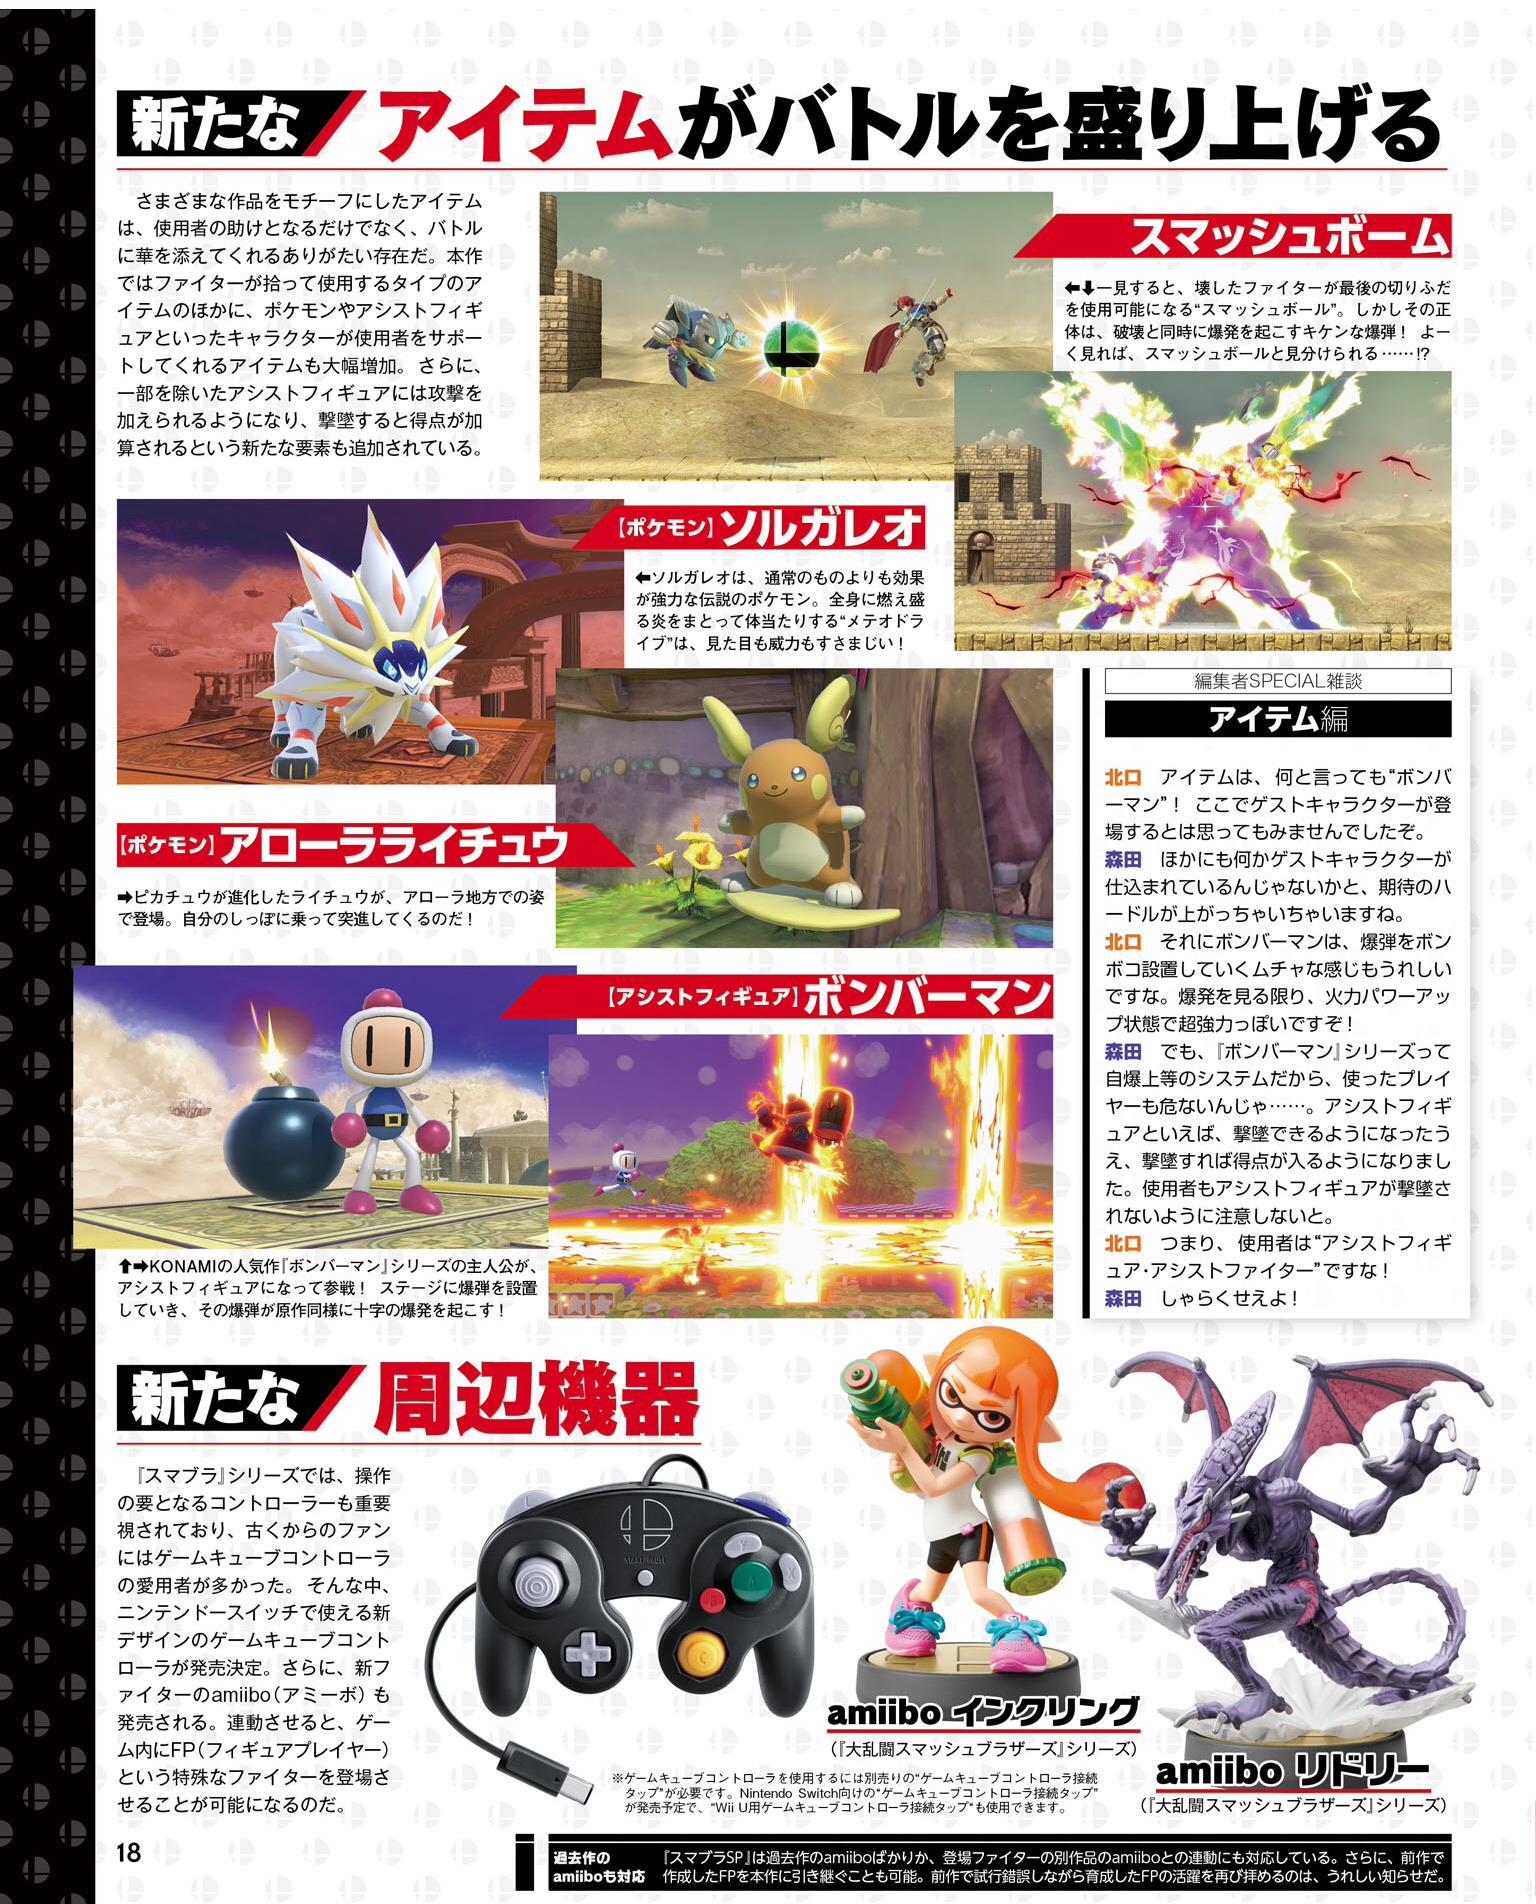 Descargar Warriors Orochi 2 Psp Mega: Smash Bros. Ultimate, Mega Man 11, More